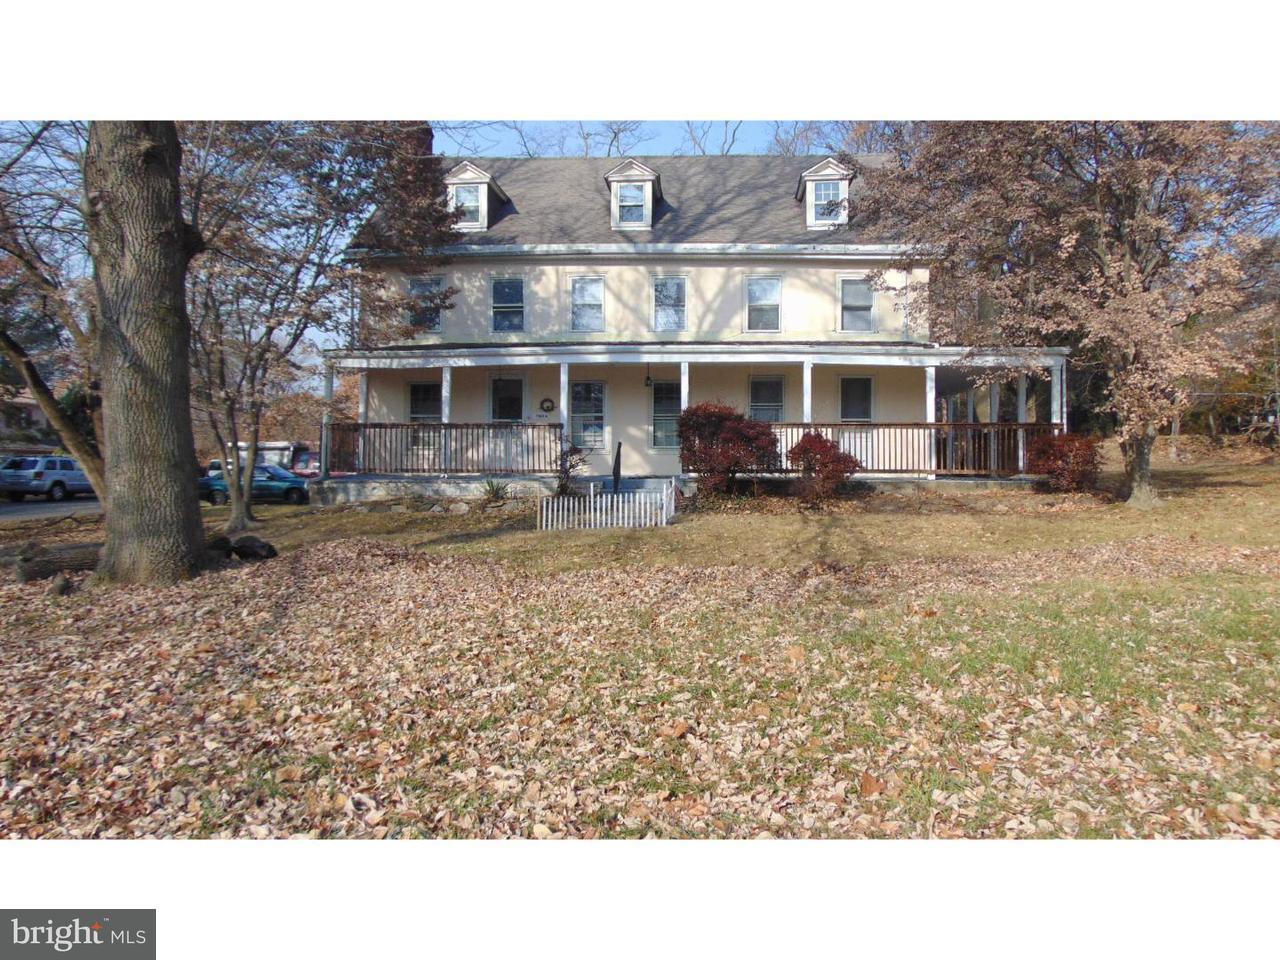 Triplex for Rent at 7500 NEW SECOND ST #7500 B Cheltenham, Pennsylvania 19027 United States